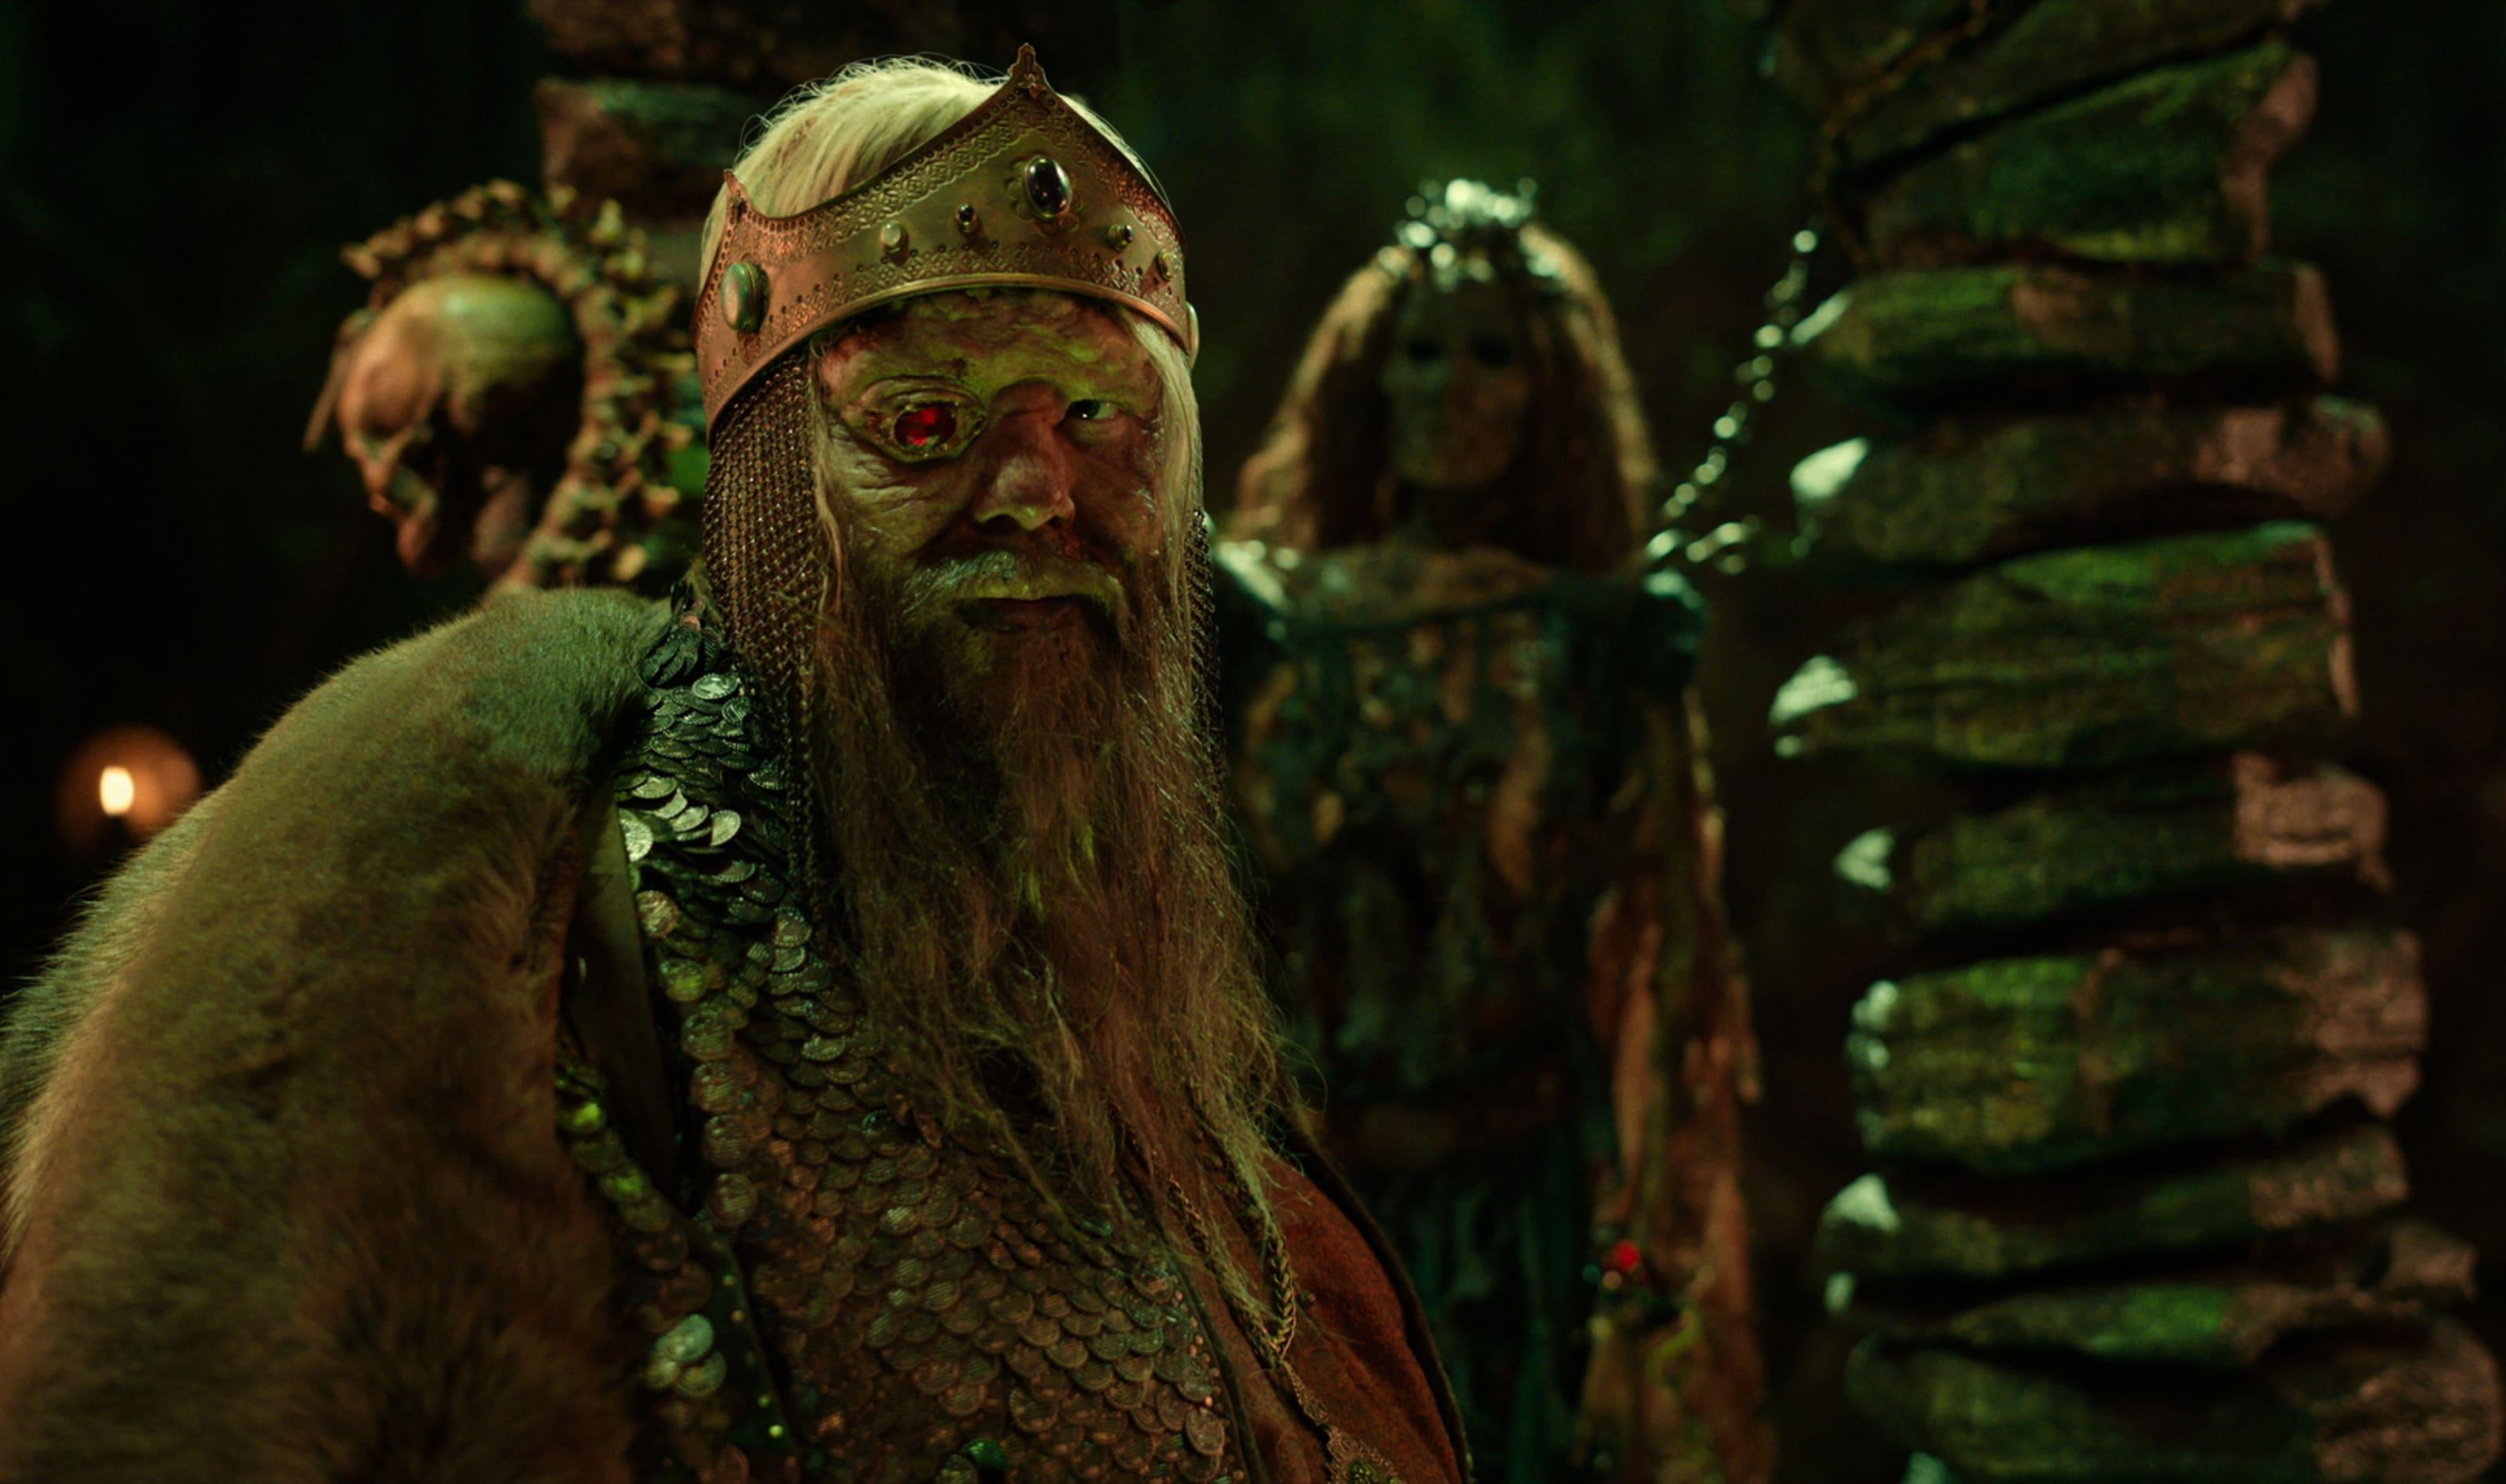 Olafur Darri Olafsoon in Netflix's Cursed